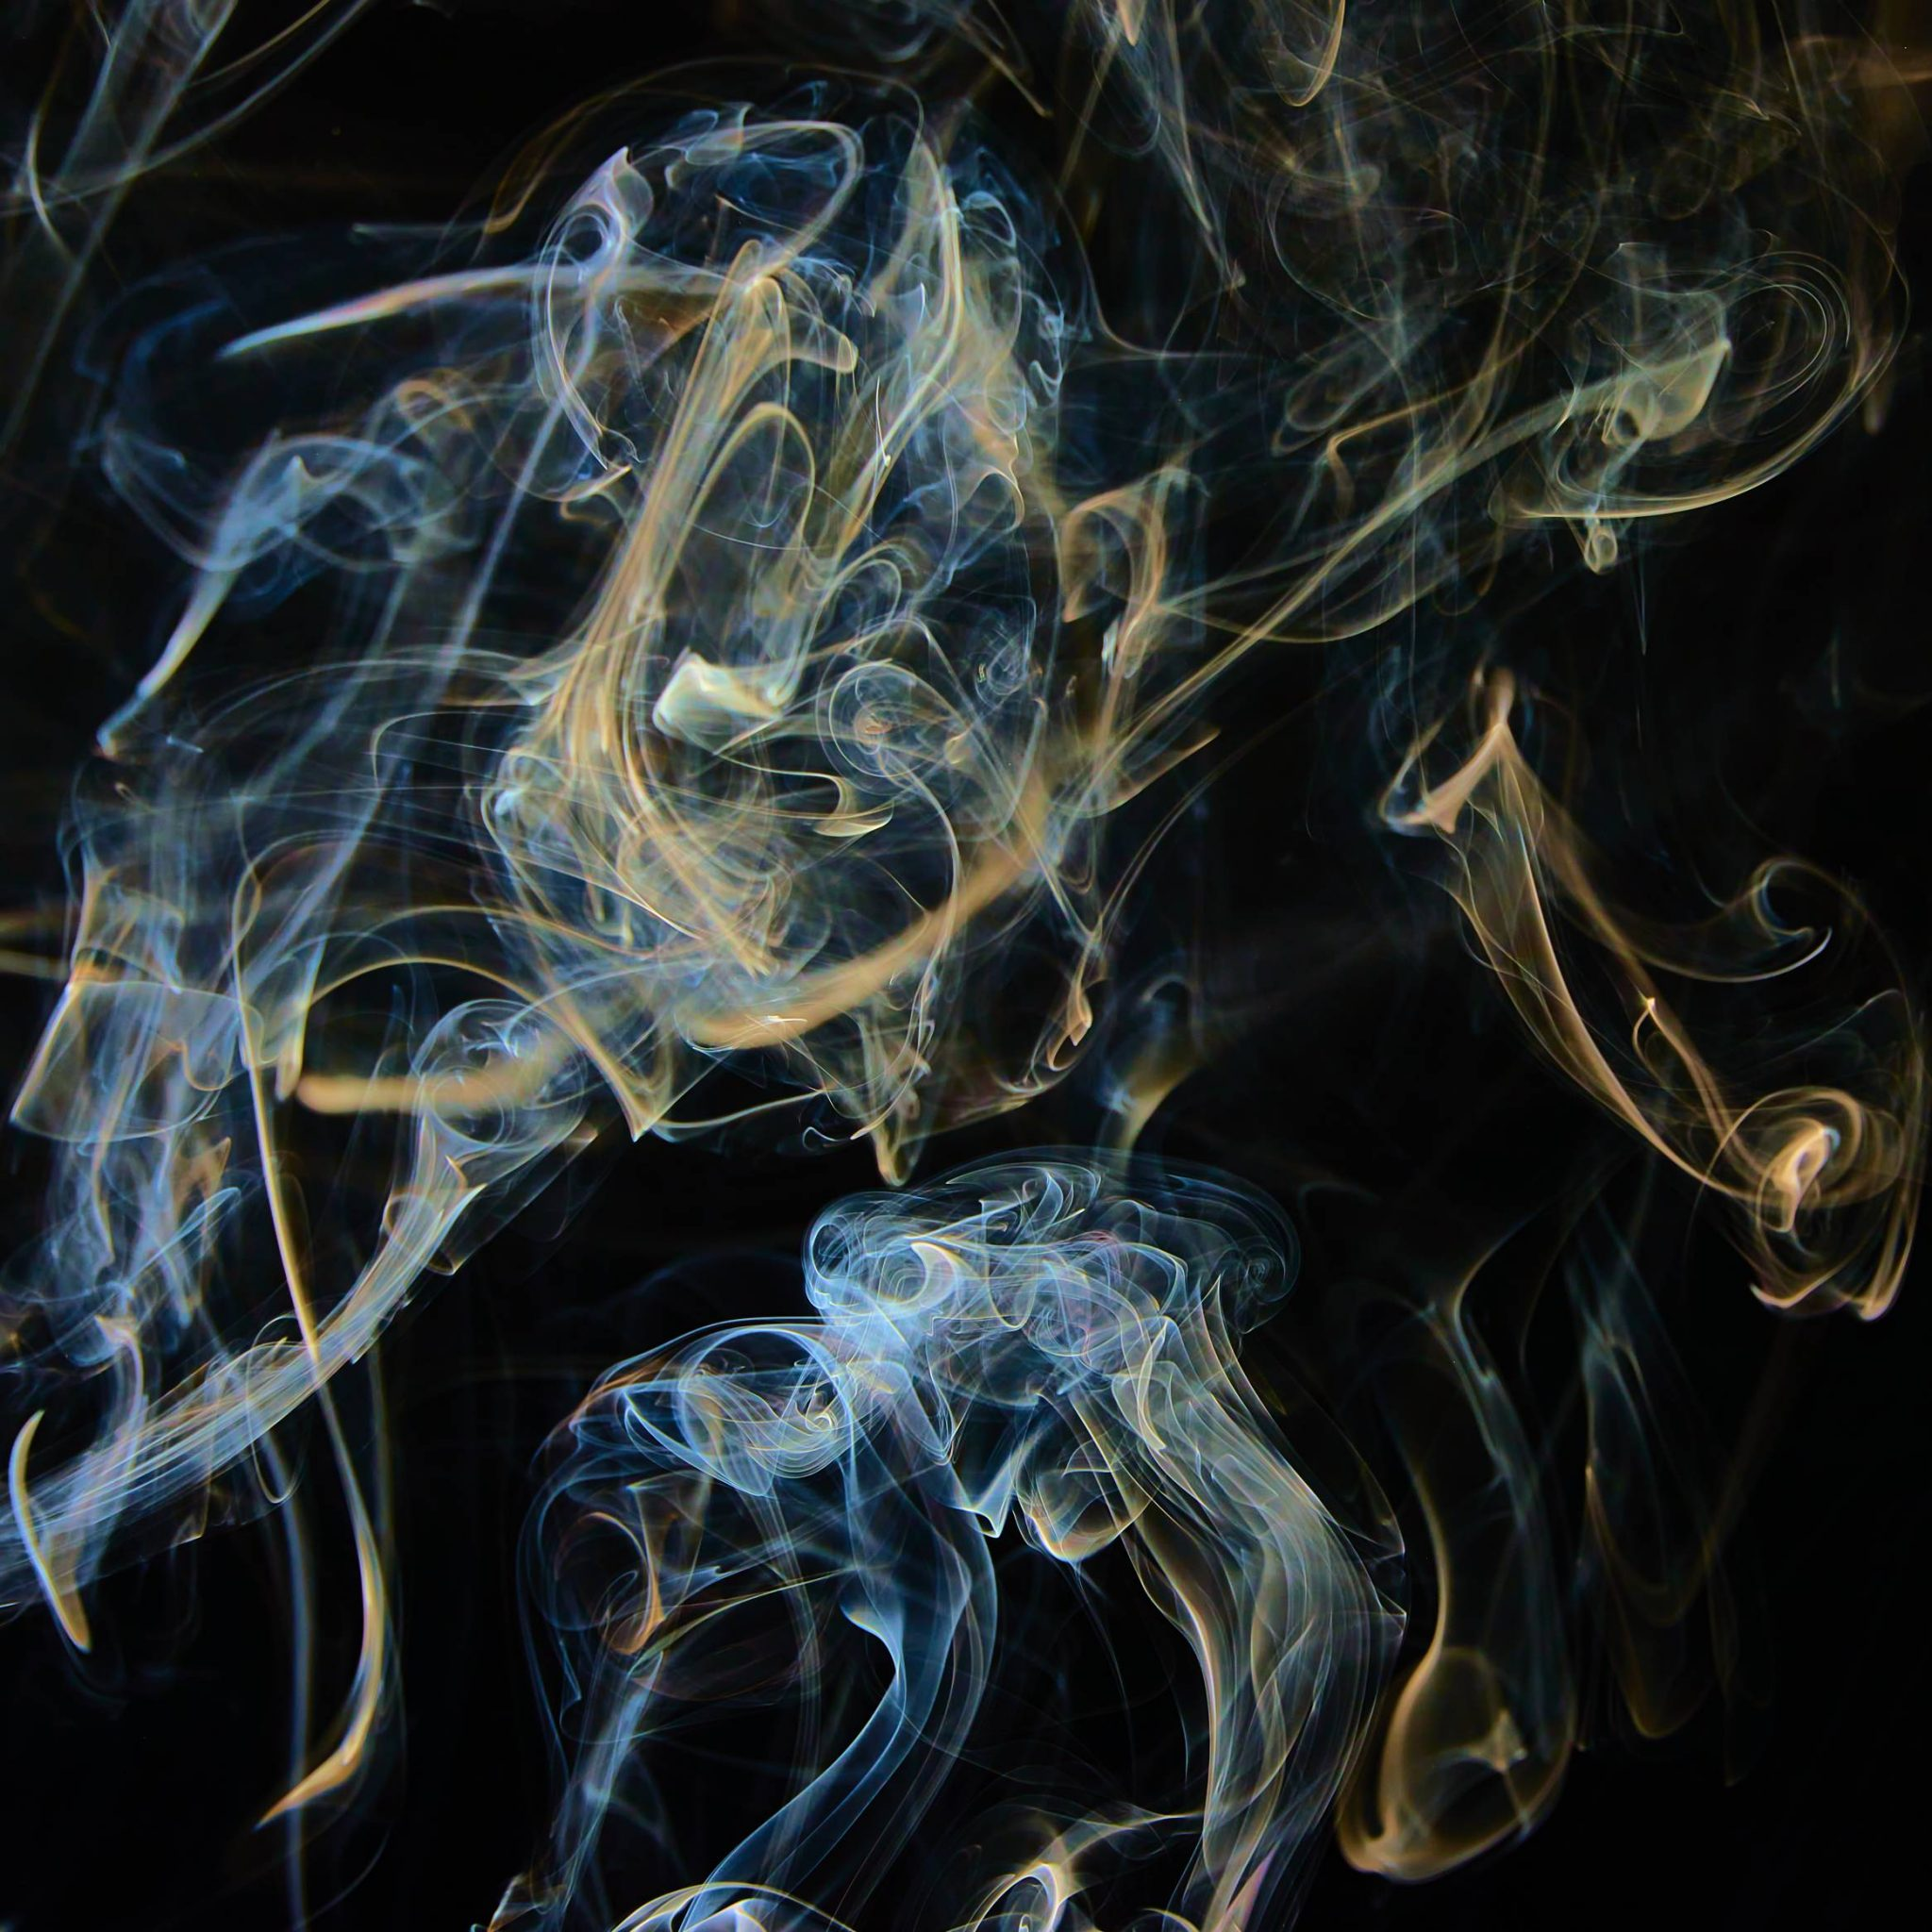 Art: New work by photographer Hendrik Jan Jager: colored smoke @Gallery CommunicationinArt